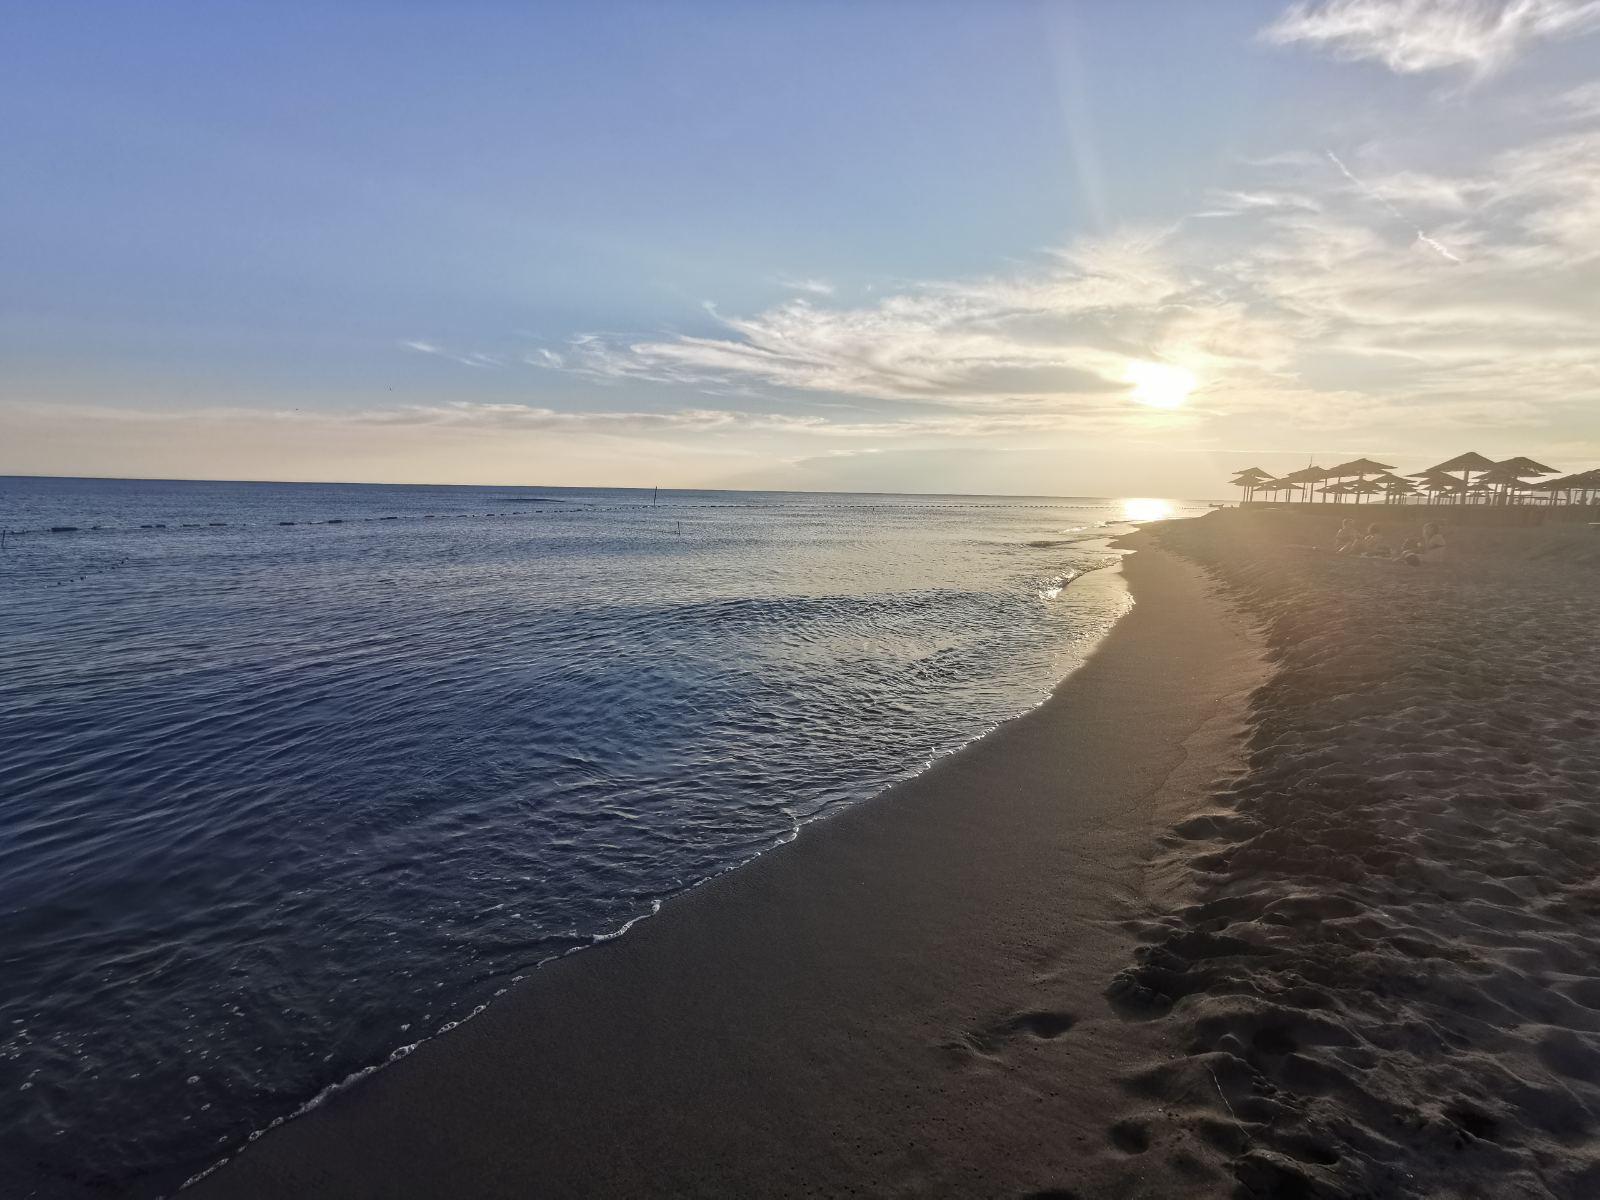 The Great beach in Ulcinj